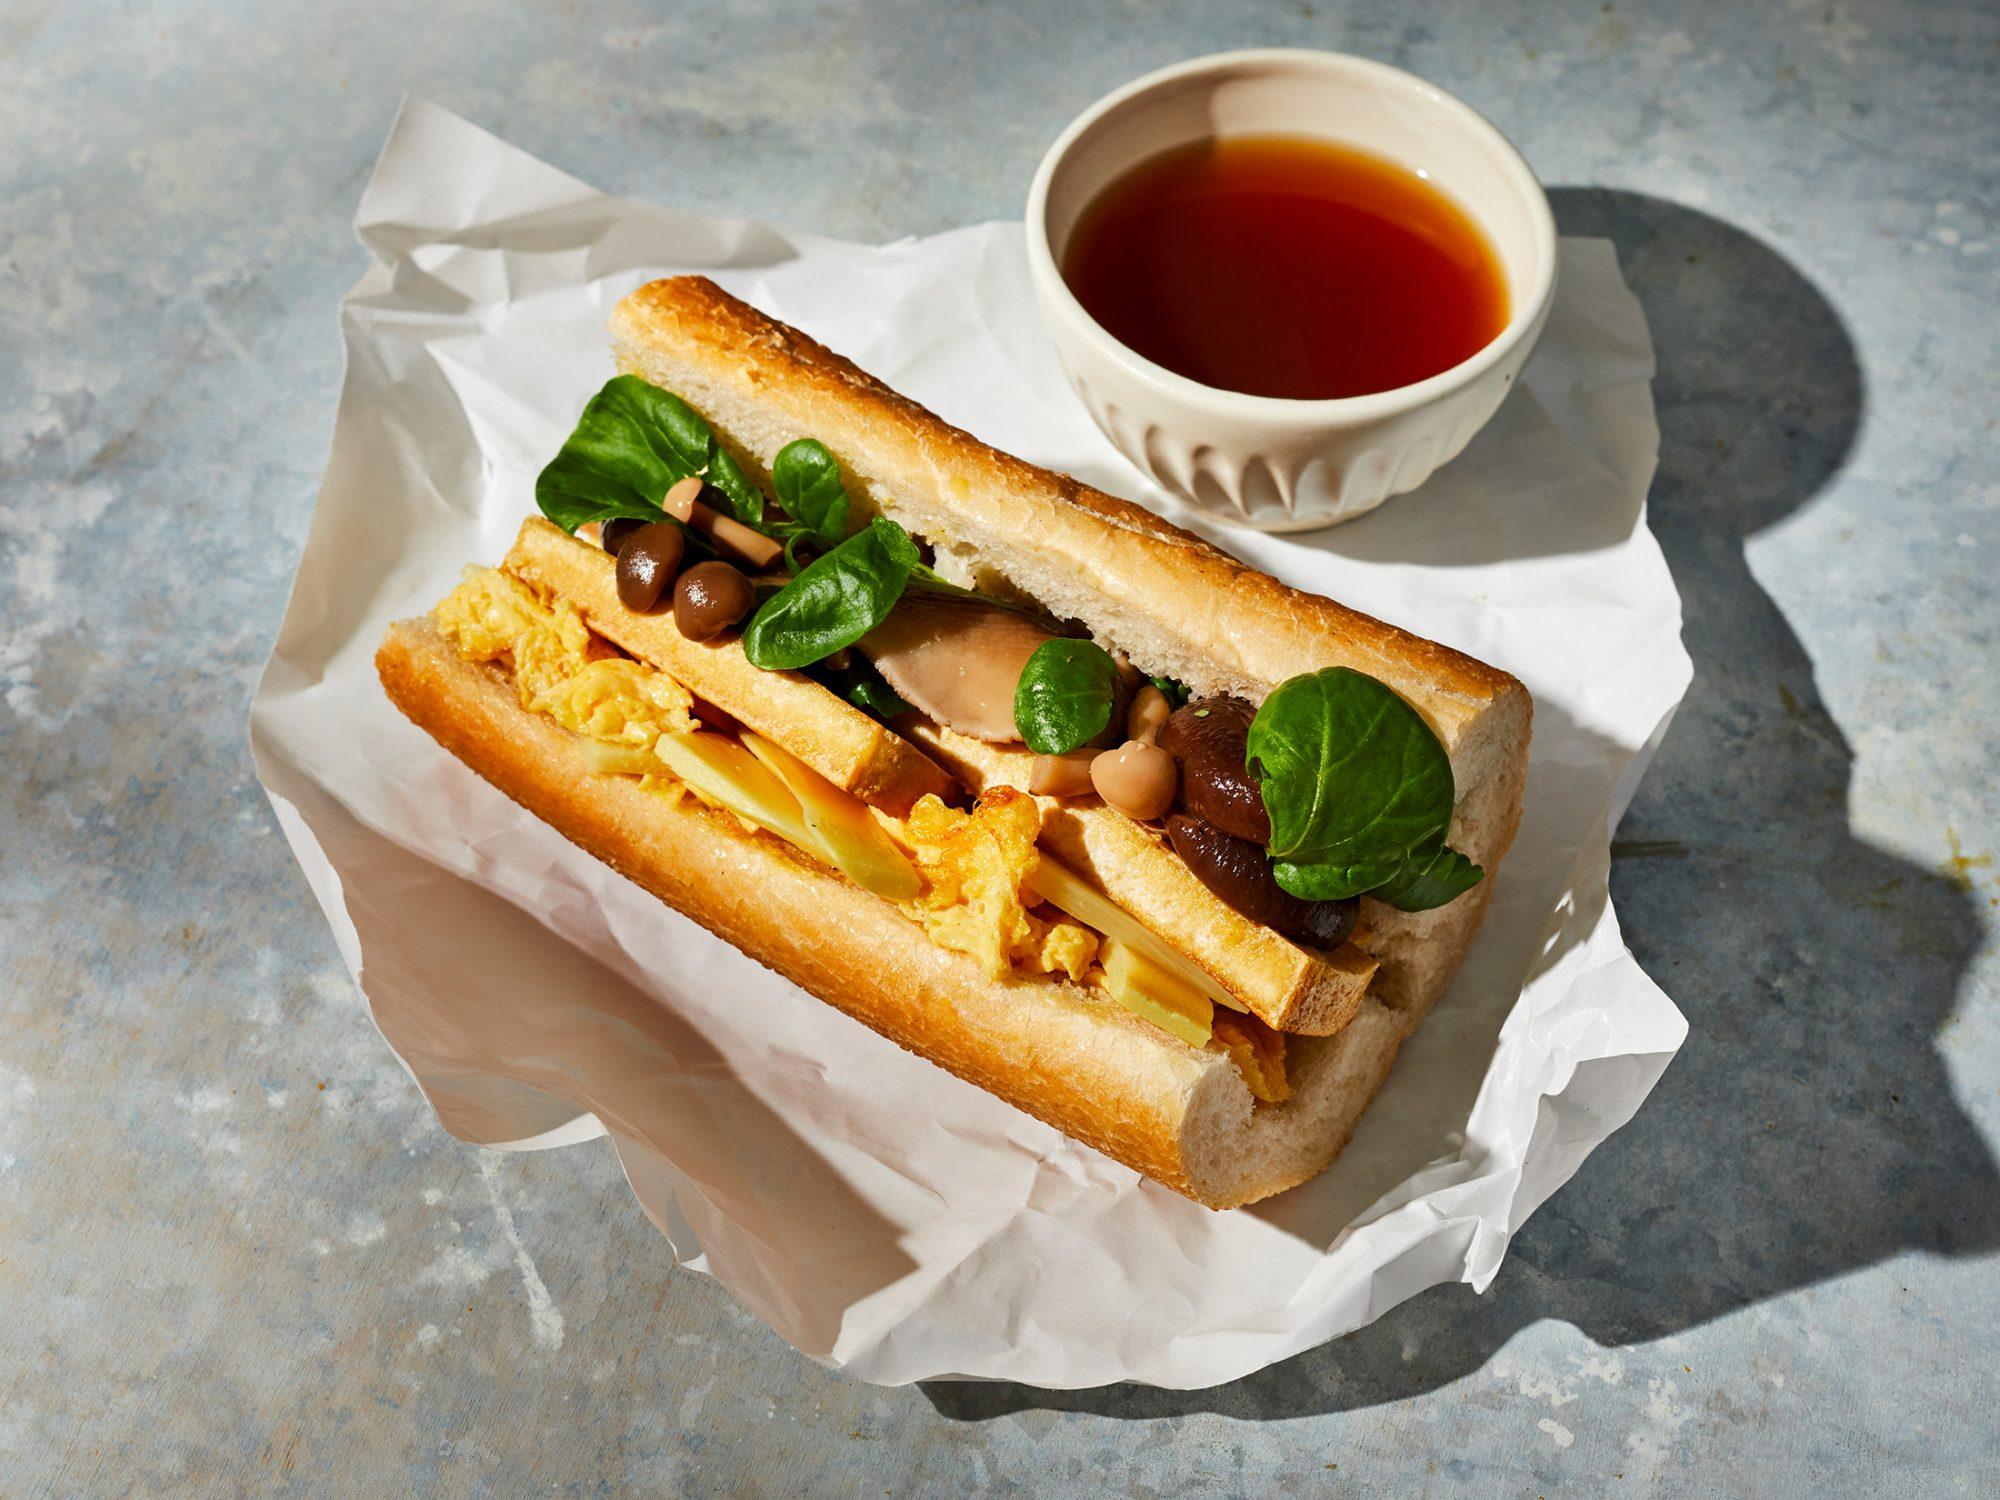 Hot-And-Sour Soup Sandwich image